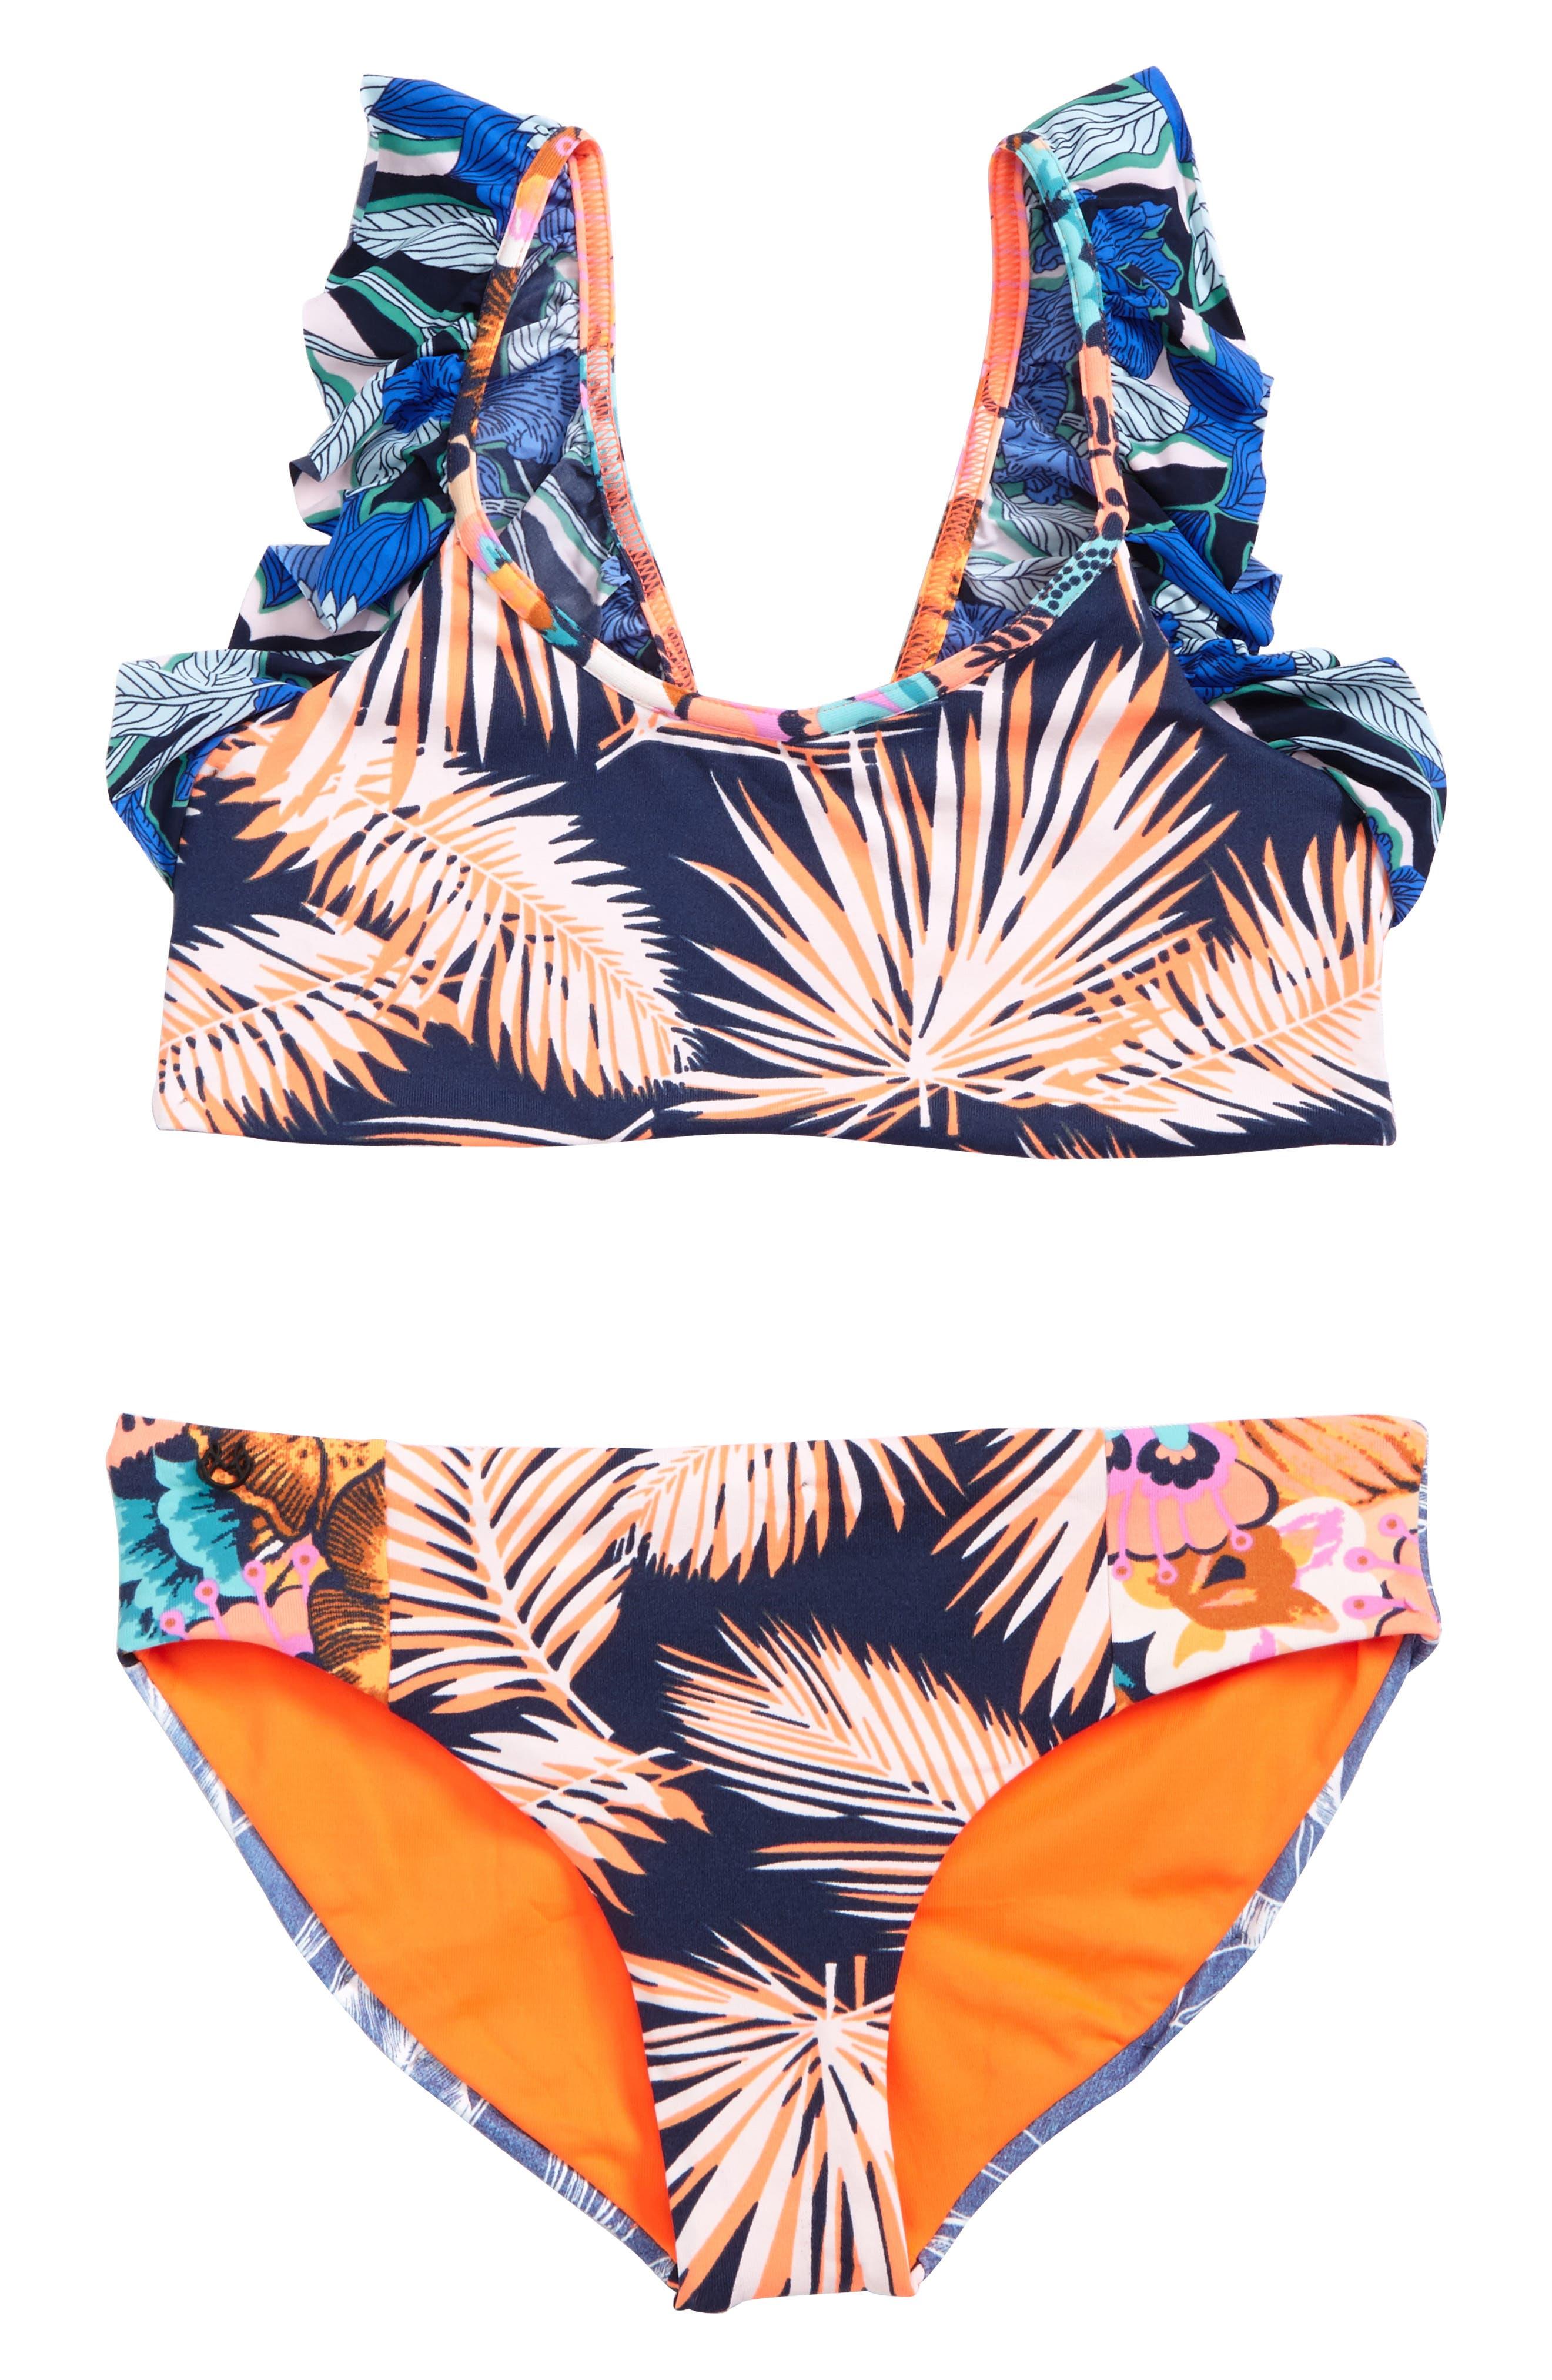 Seaside Palenque Two-Piece Swimsuit,                             Main thumbnail 1, color,                             Blue